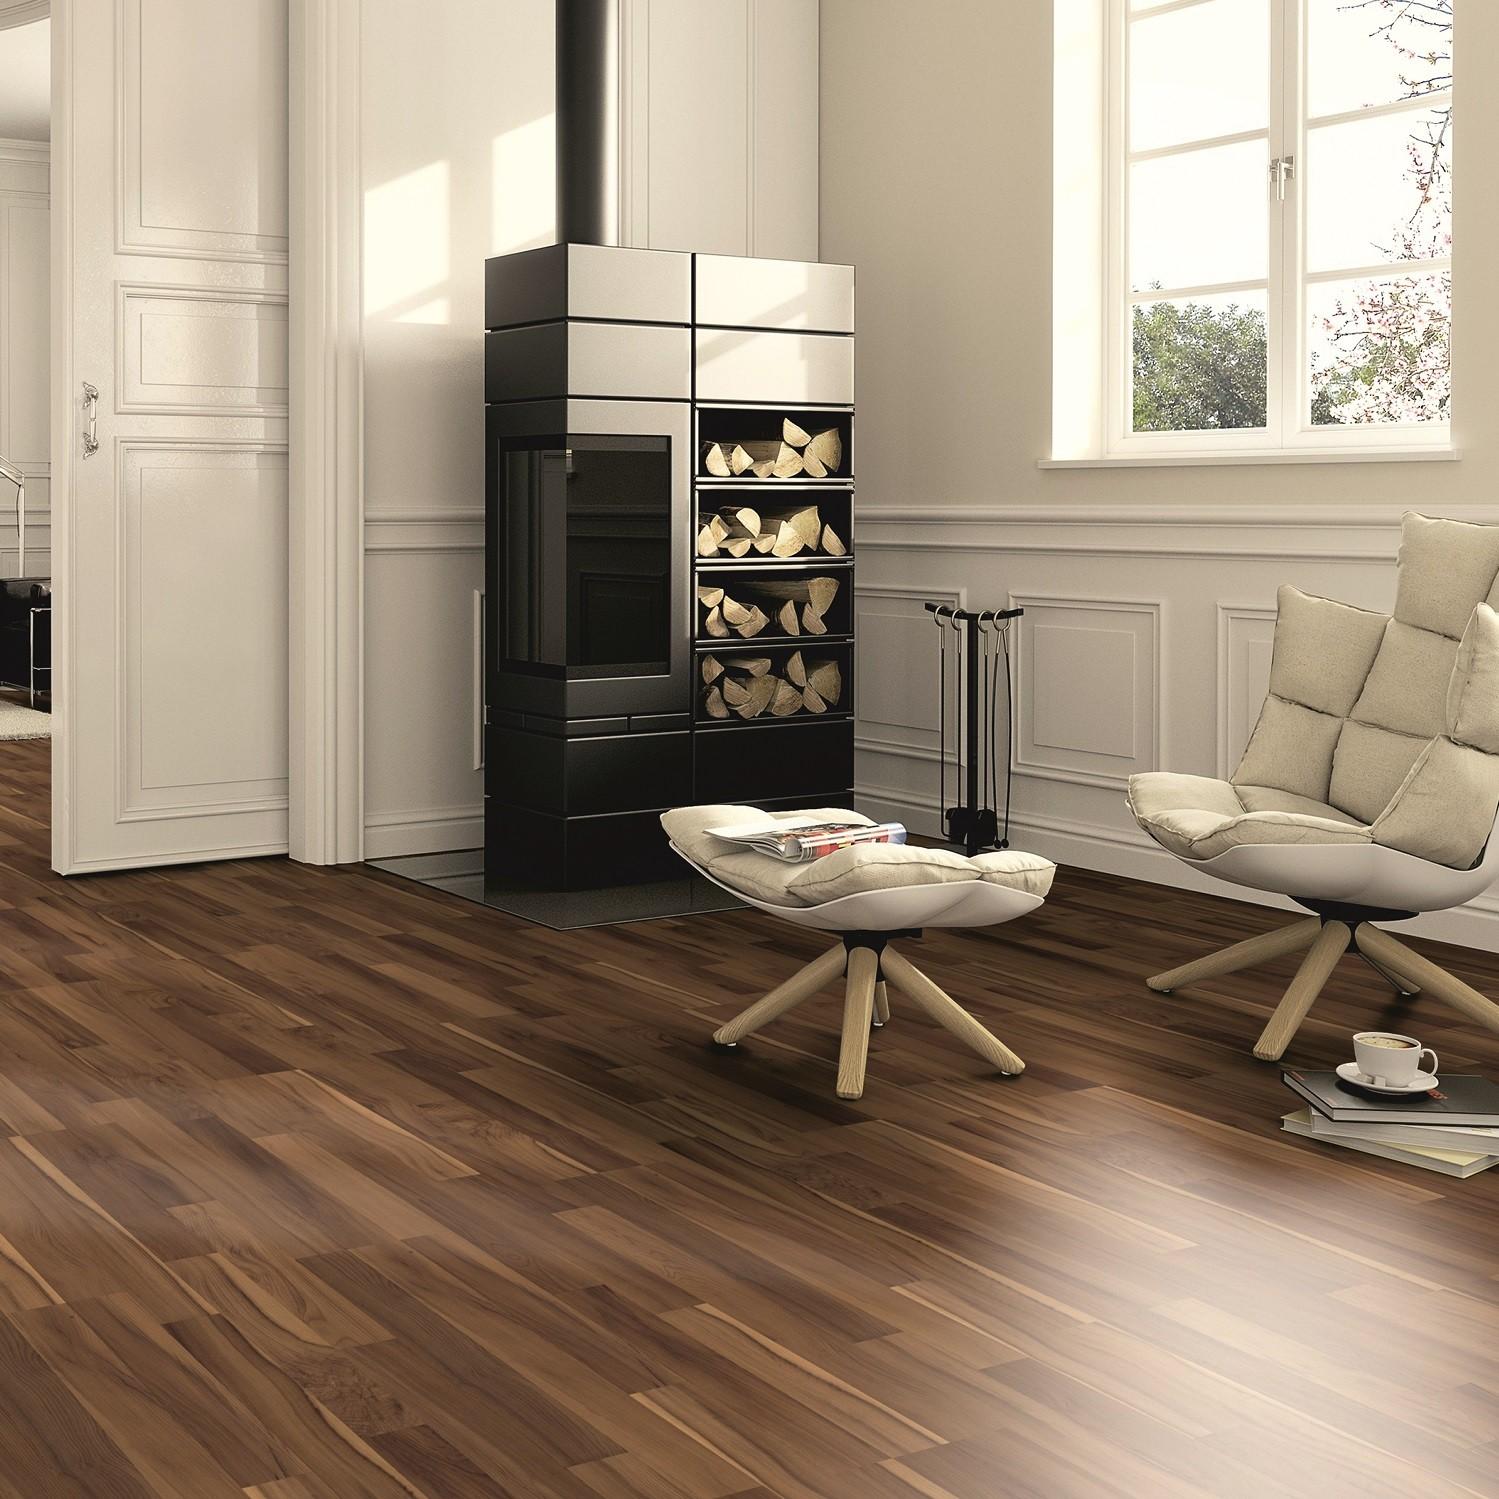 laminat eibe mandelbraun schiffsboden ter h rne avatara. Black Bedroom Furniture Sets. Home Design Ideas